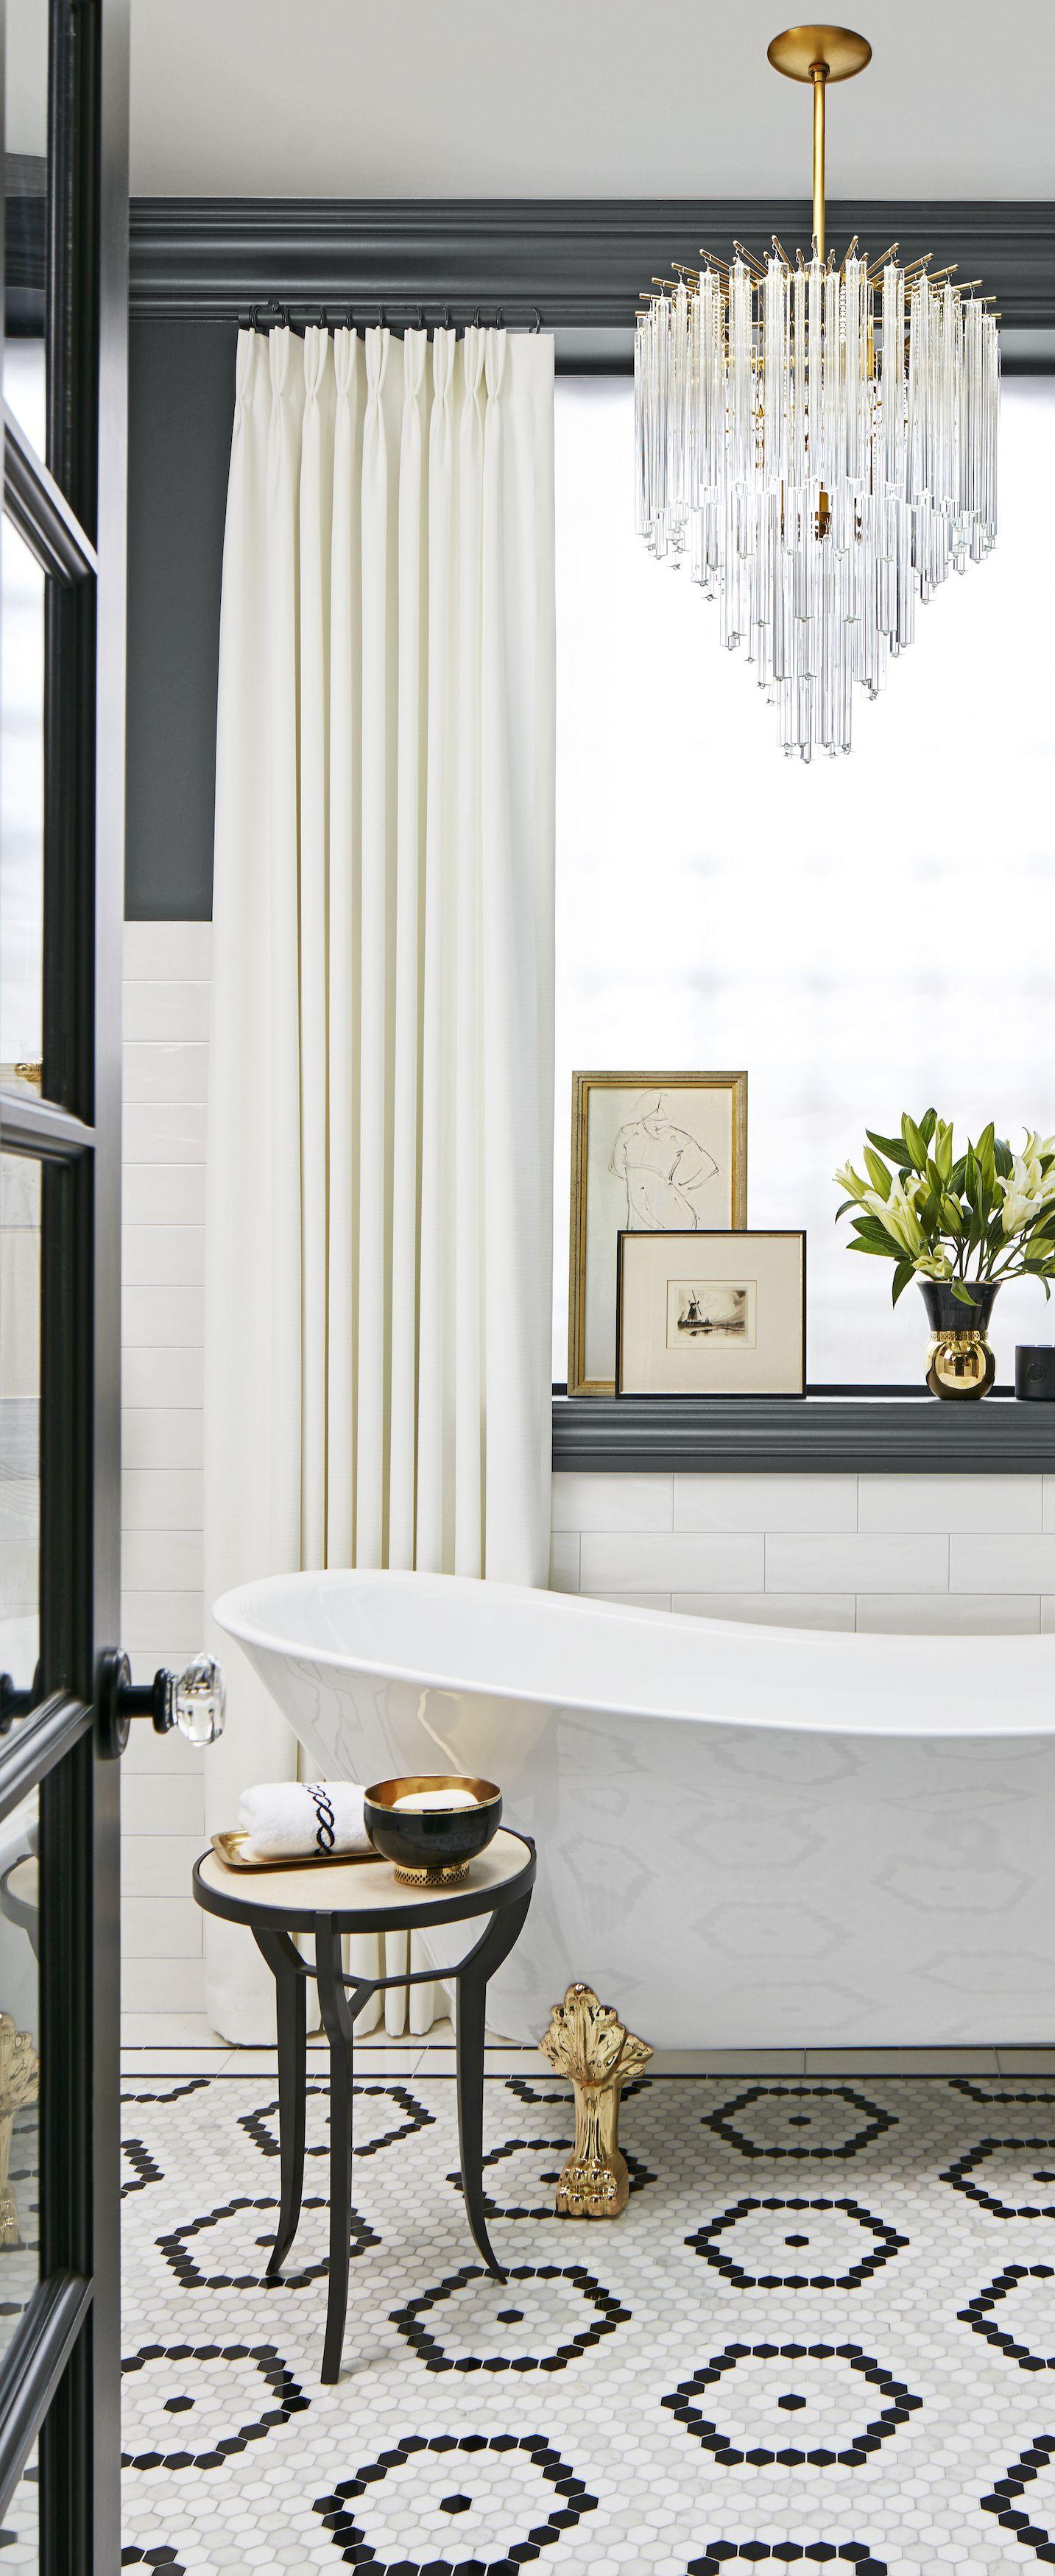 Bathroom Ideas | MODERN GLAM | Pinterest | Glamorous bathroom ...